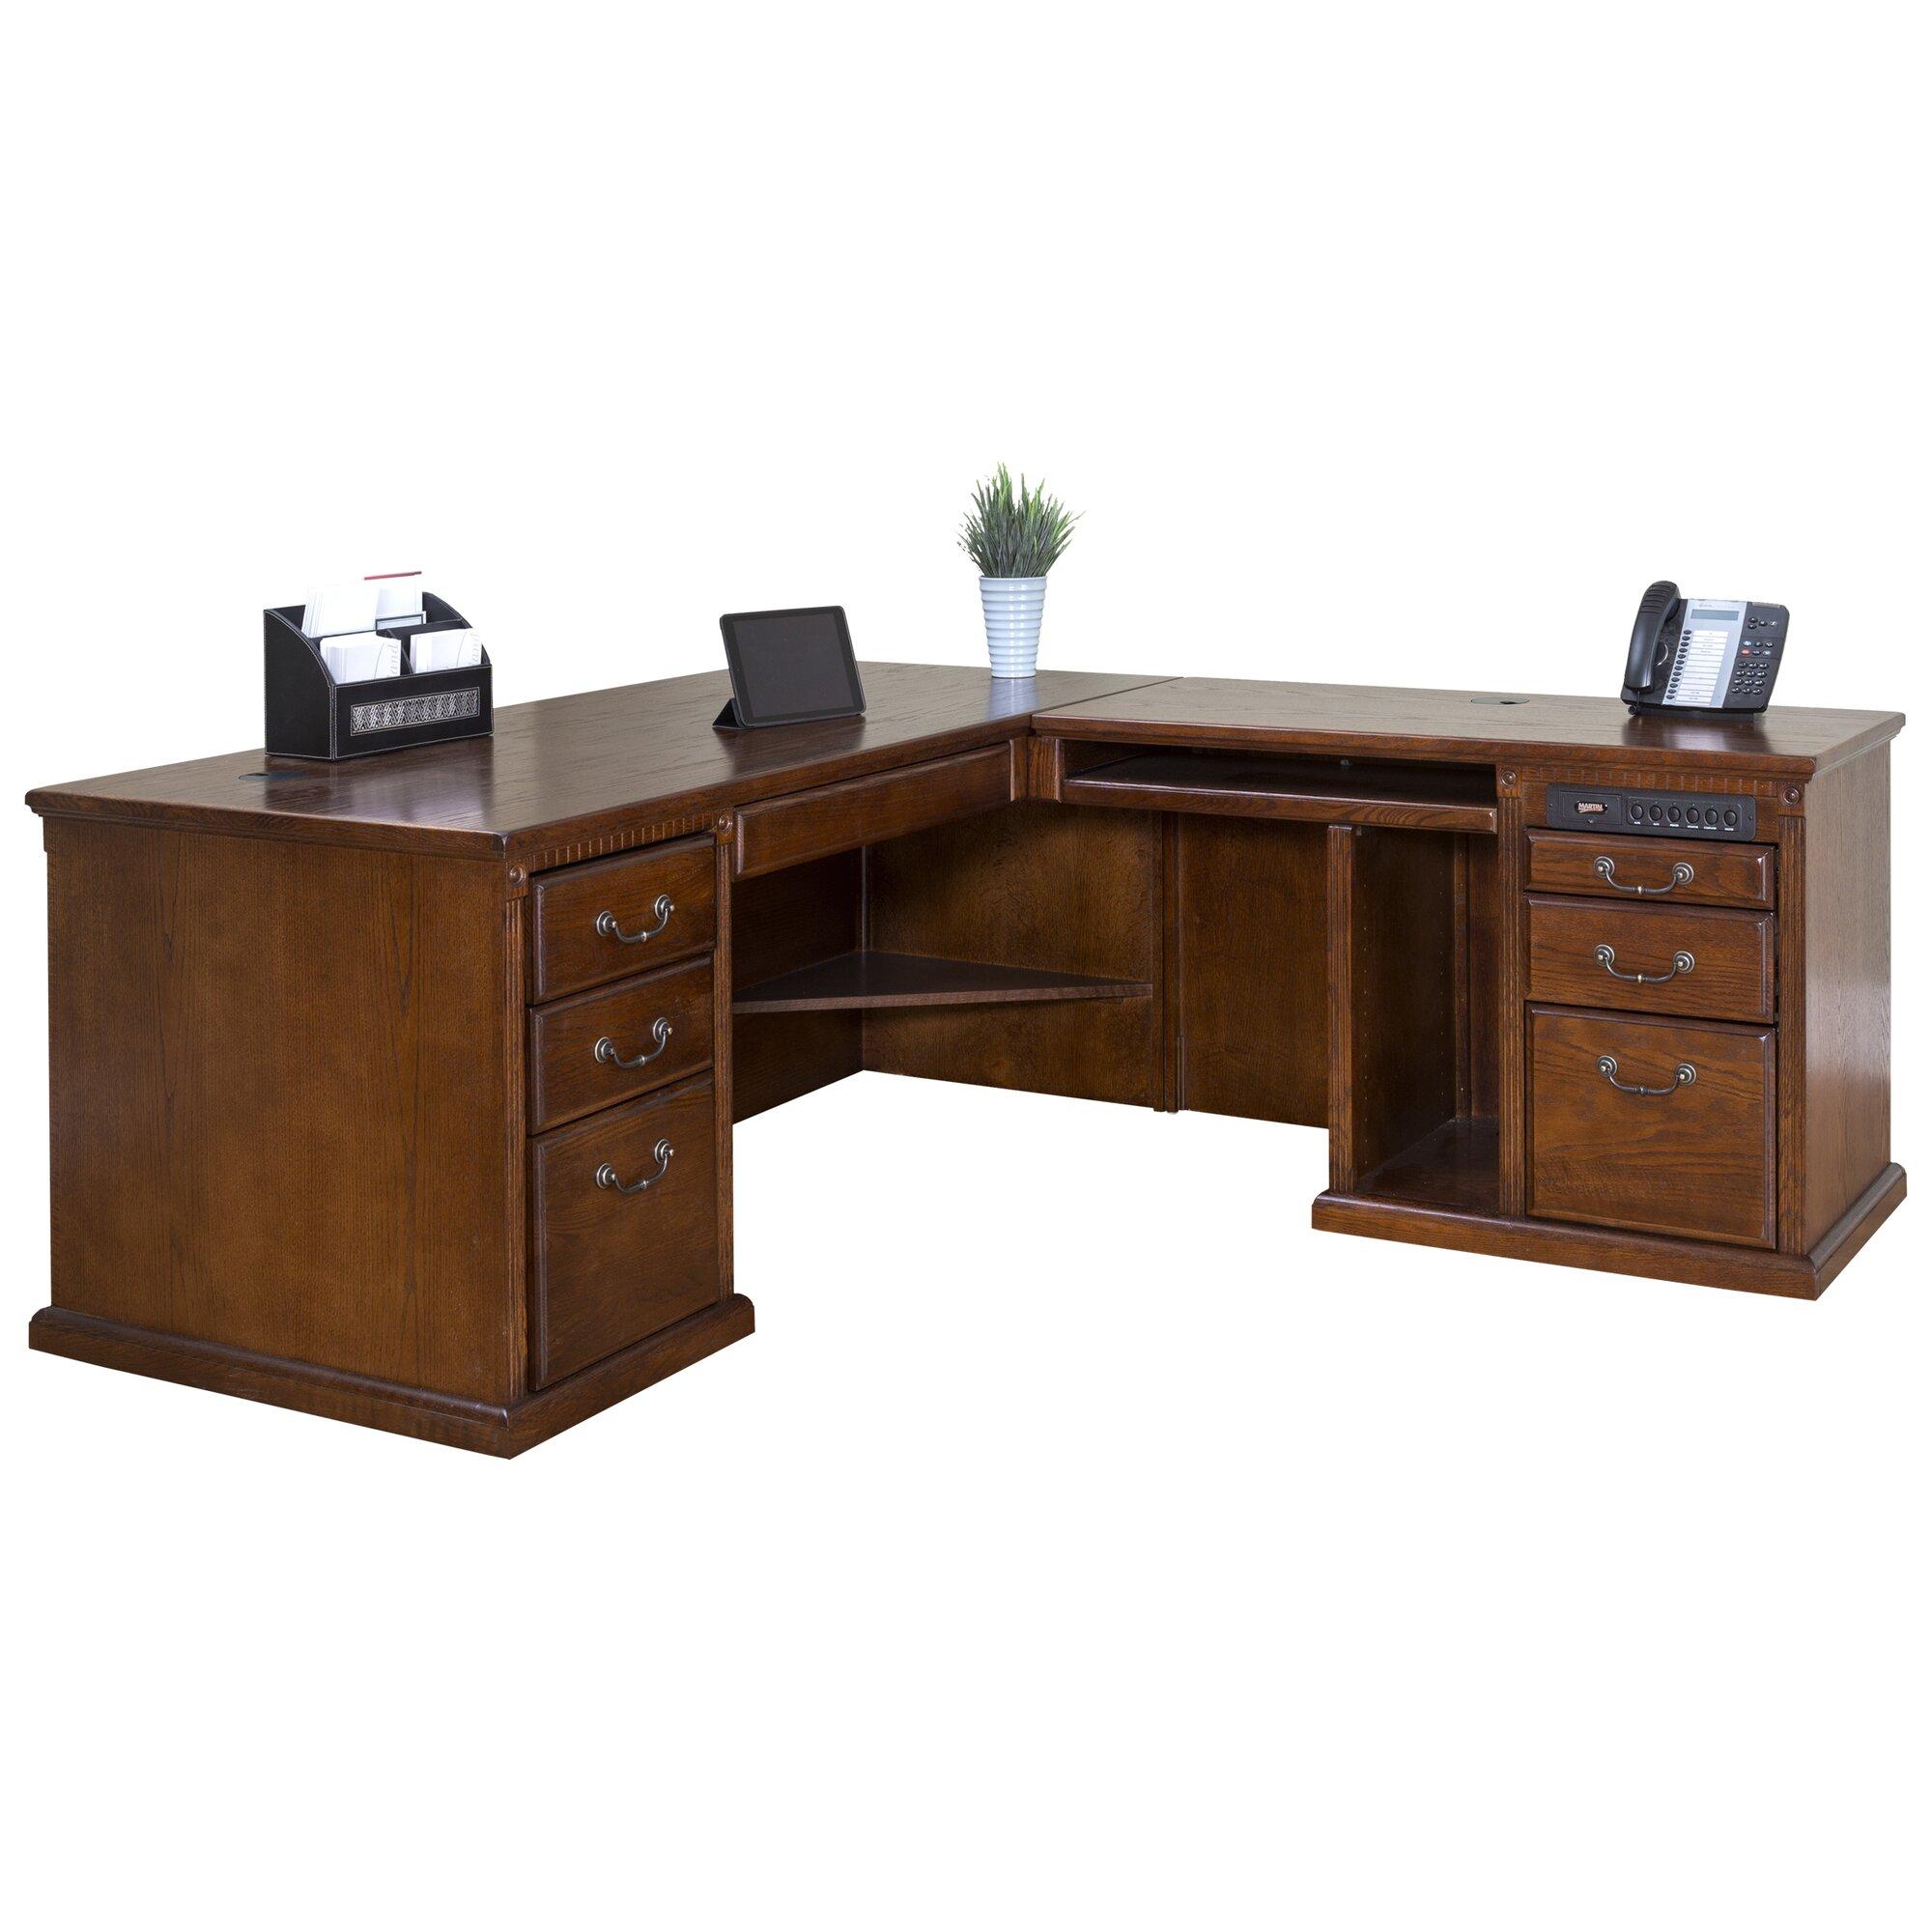 Martin Home Furnishings Huntington Oxford L Shape Executive Desk With Hutch Reviews Wayfair